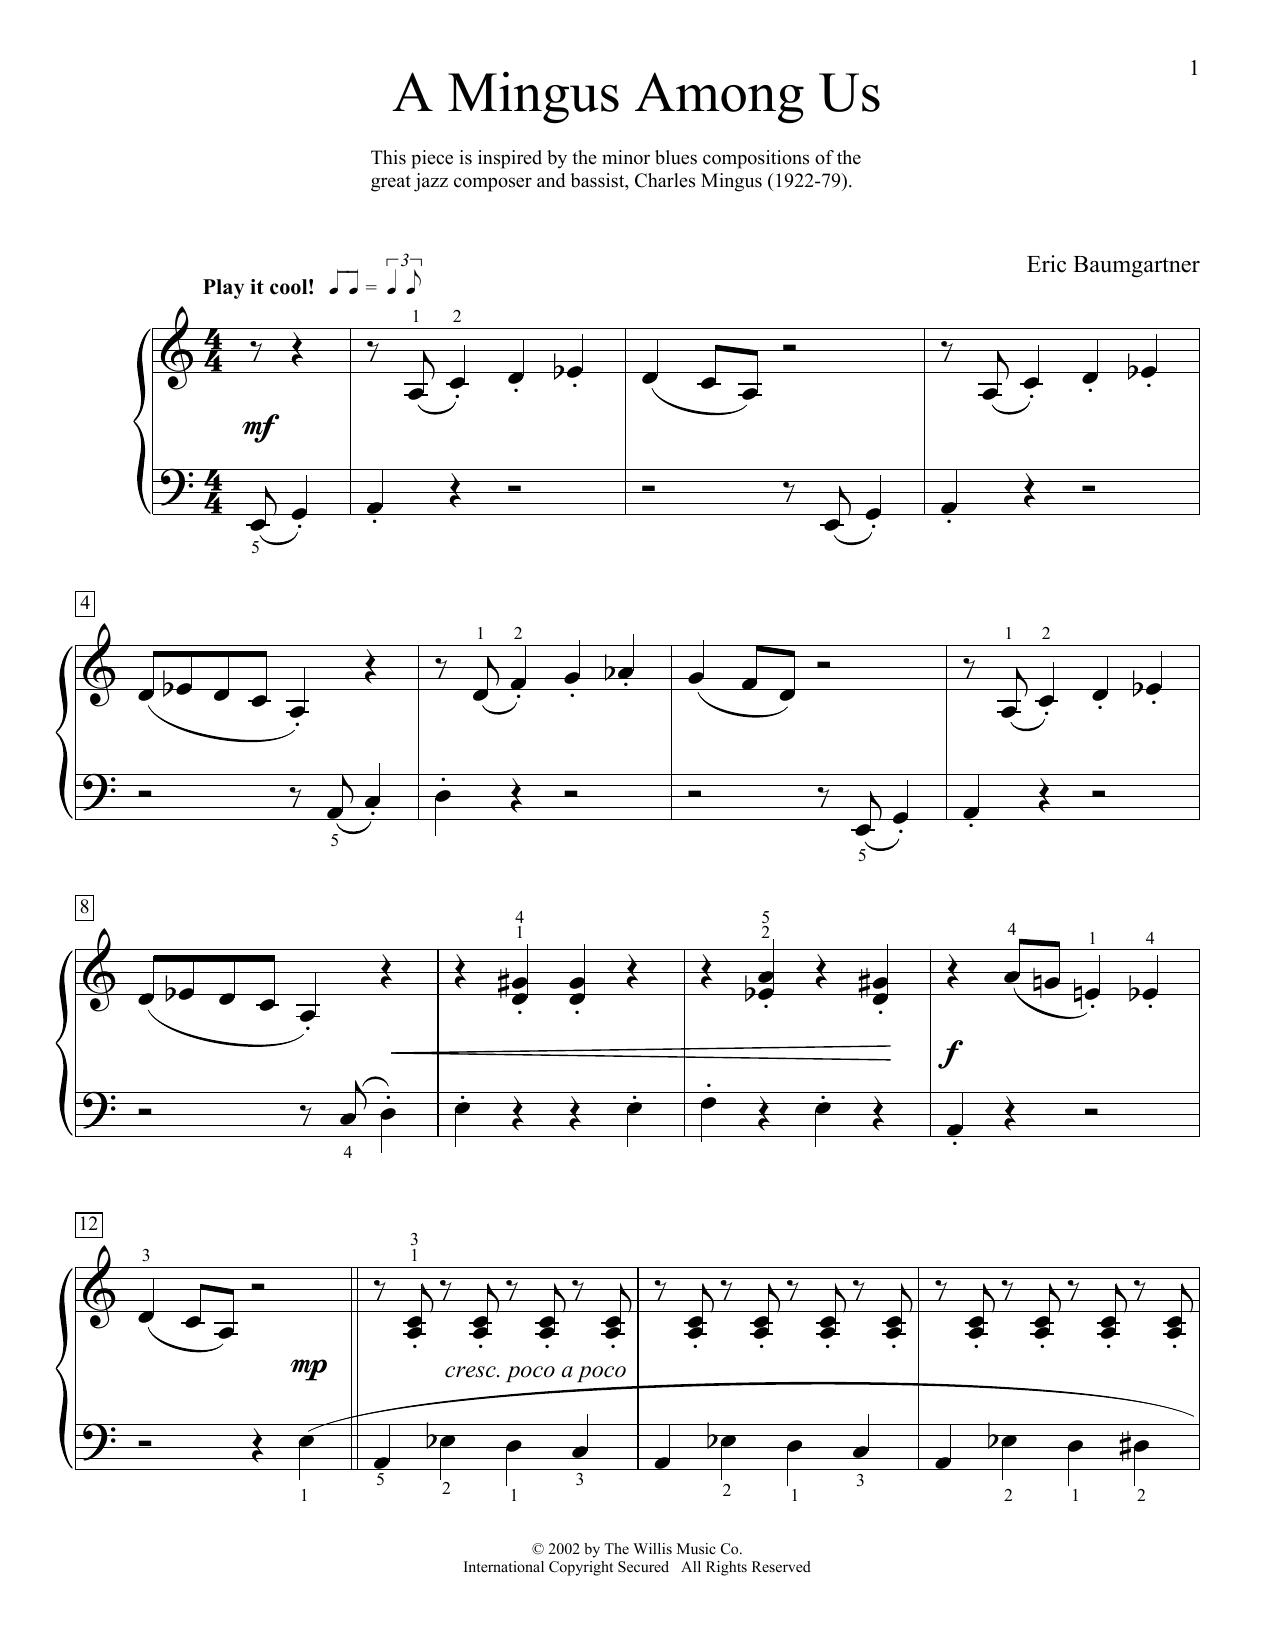 Eric Baumgartner A Mingus Among Us sheet music notes and chords. Download Printable PDF.